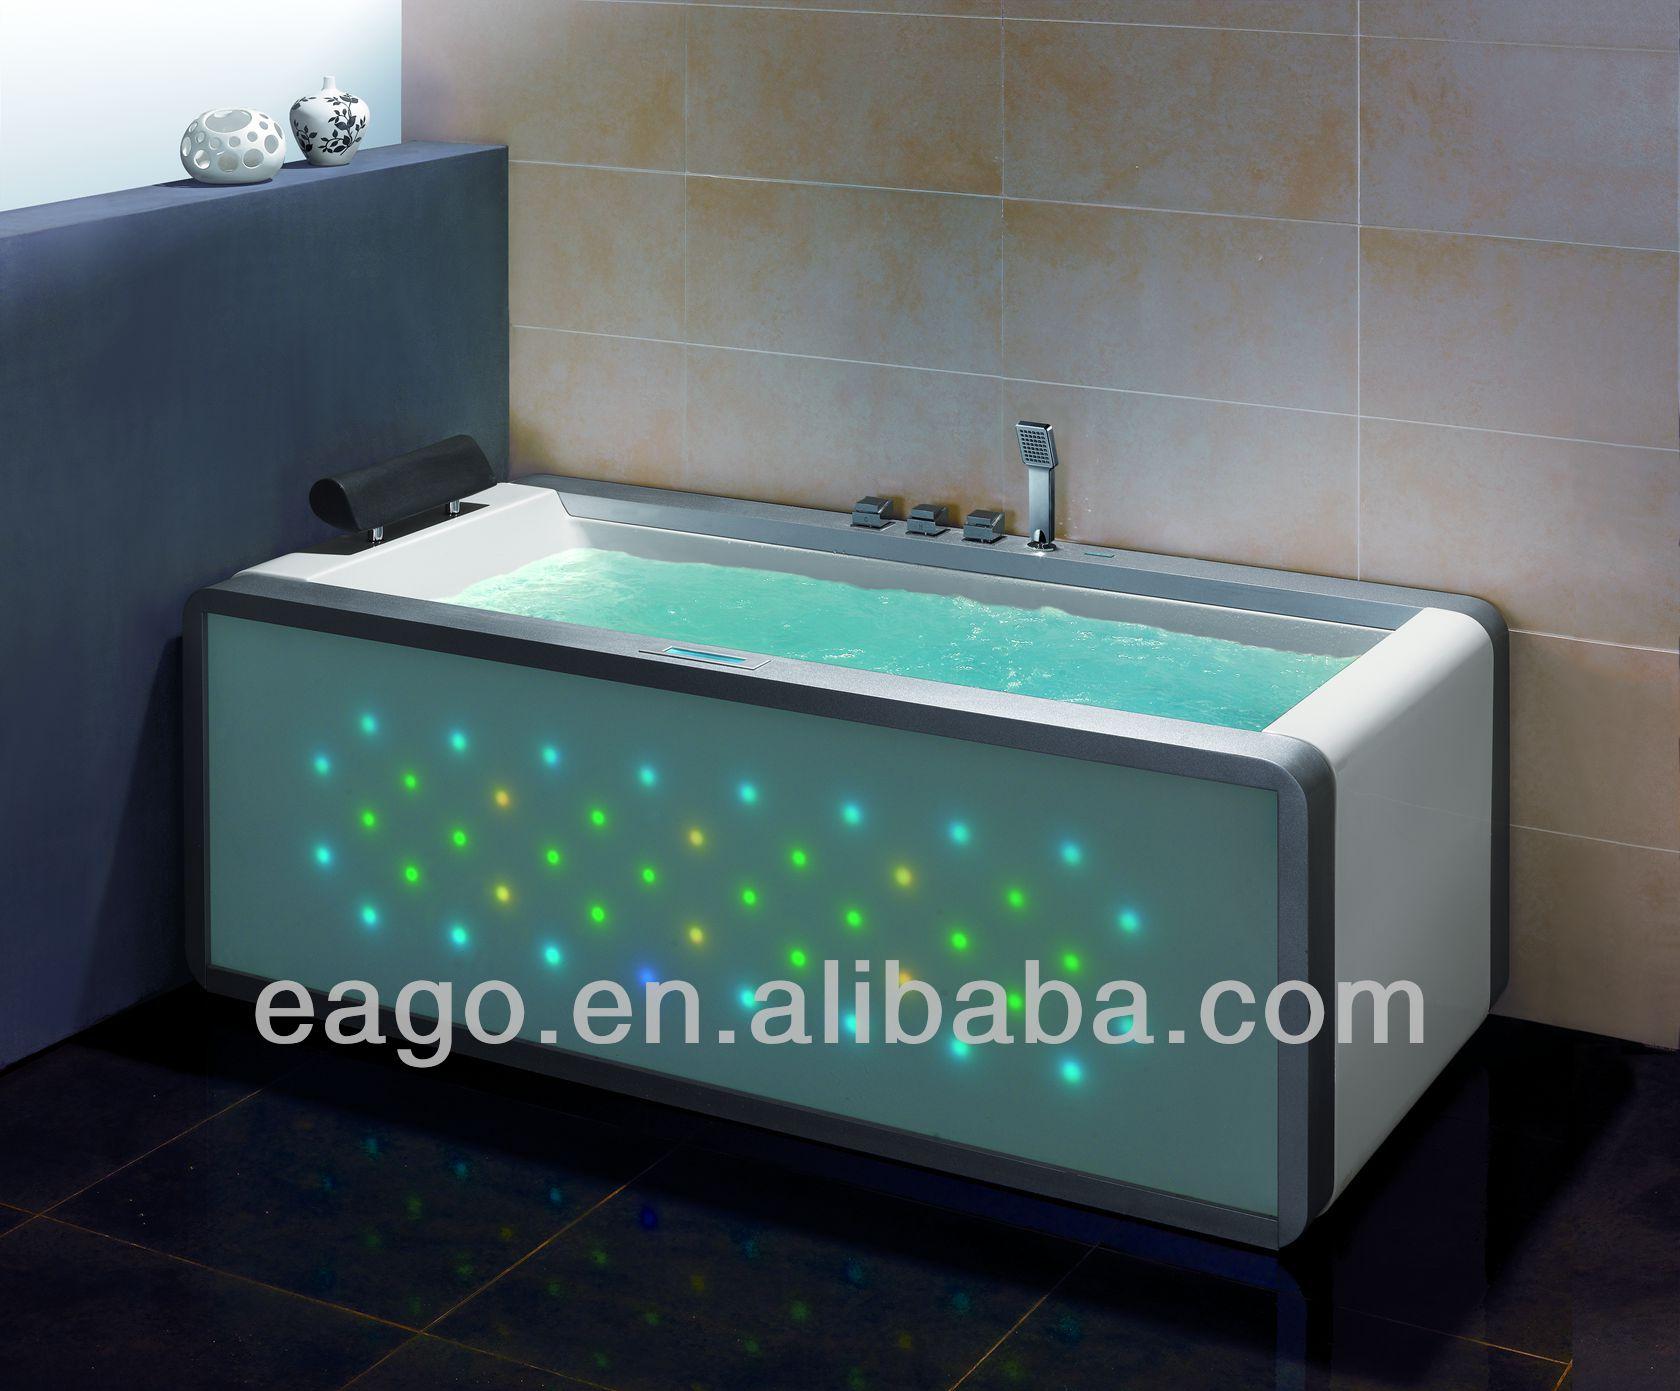 Eago Whirlpool Bathtub For One Person/massage Bathtub/unique Led ...